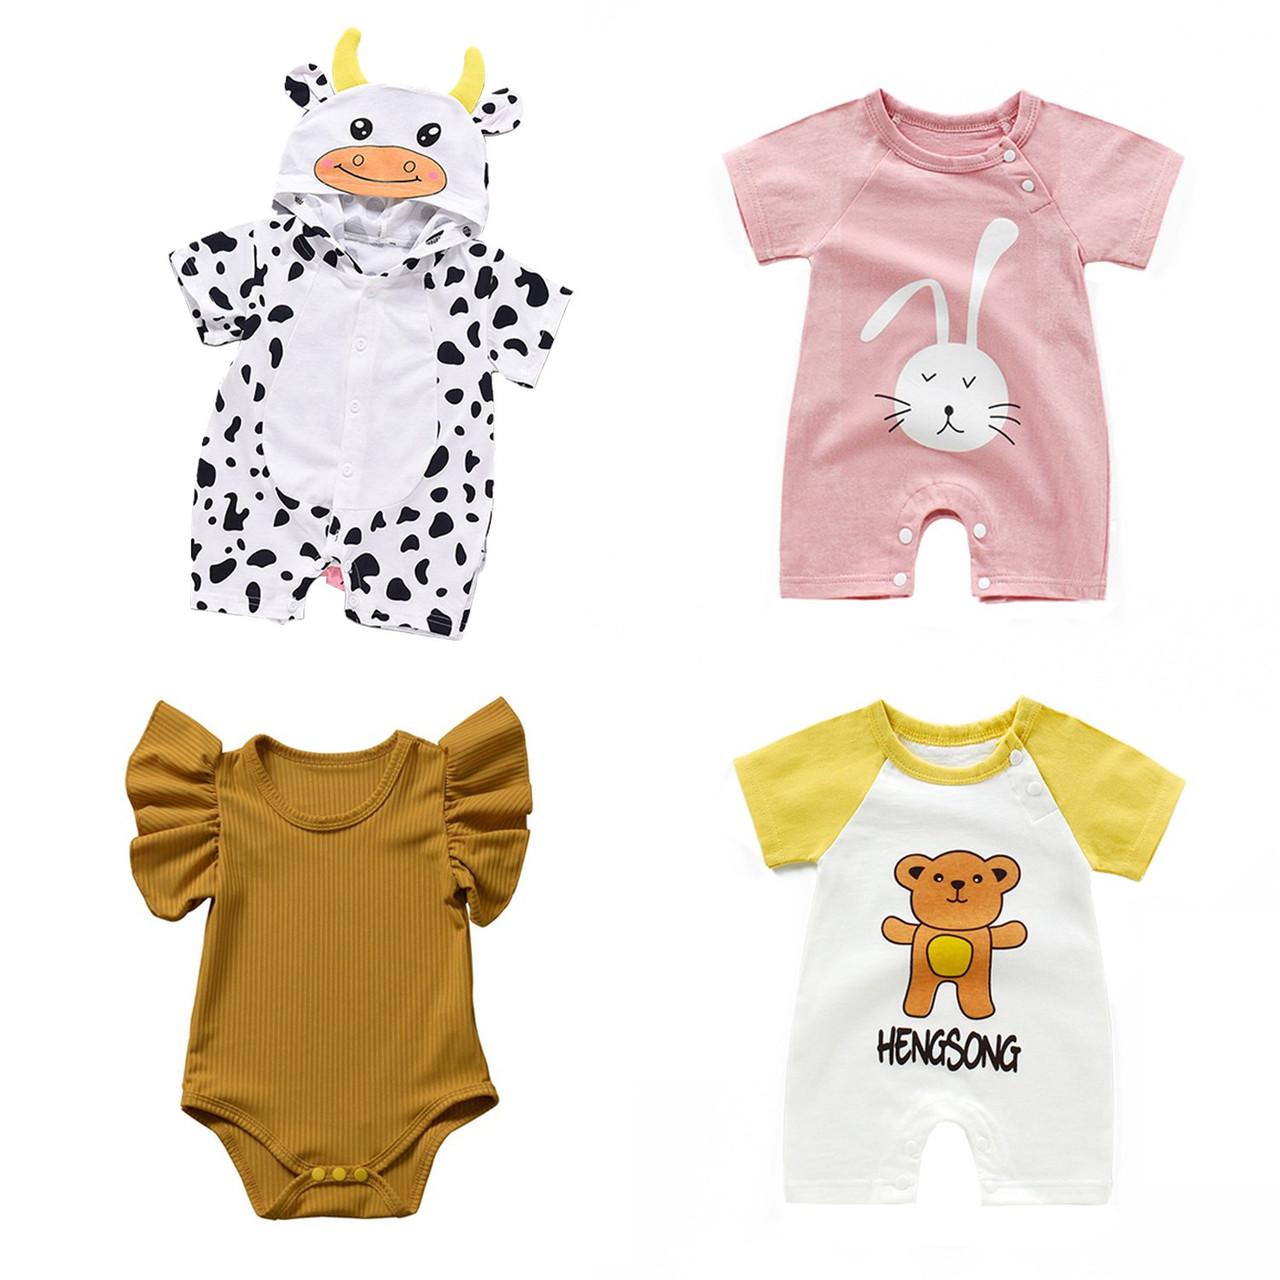 Toddler Baby Boy Girl Fox Tree Romper Summer Sleeveless Jumpsuit Clo EE/_ UK/_ FM